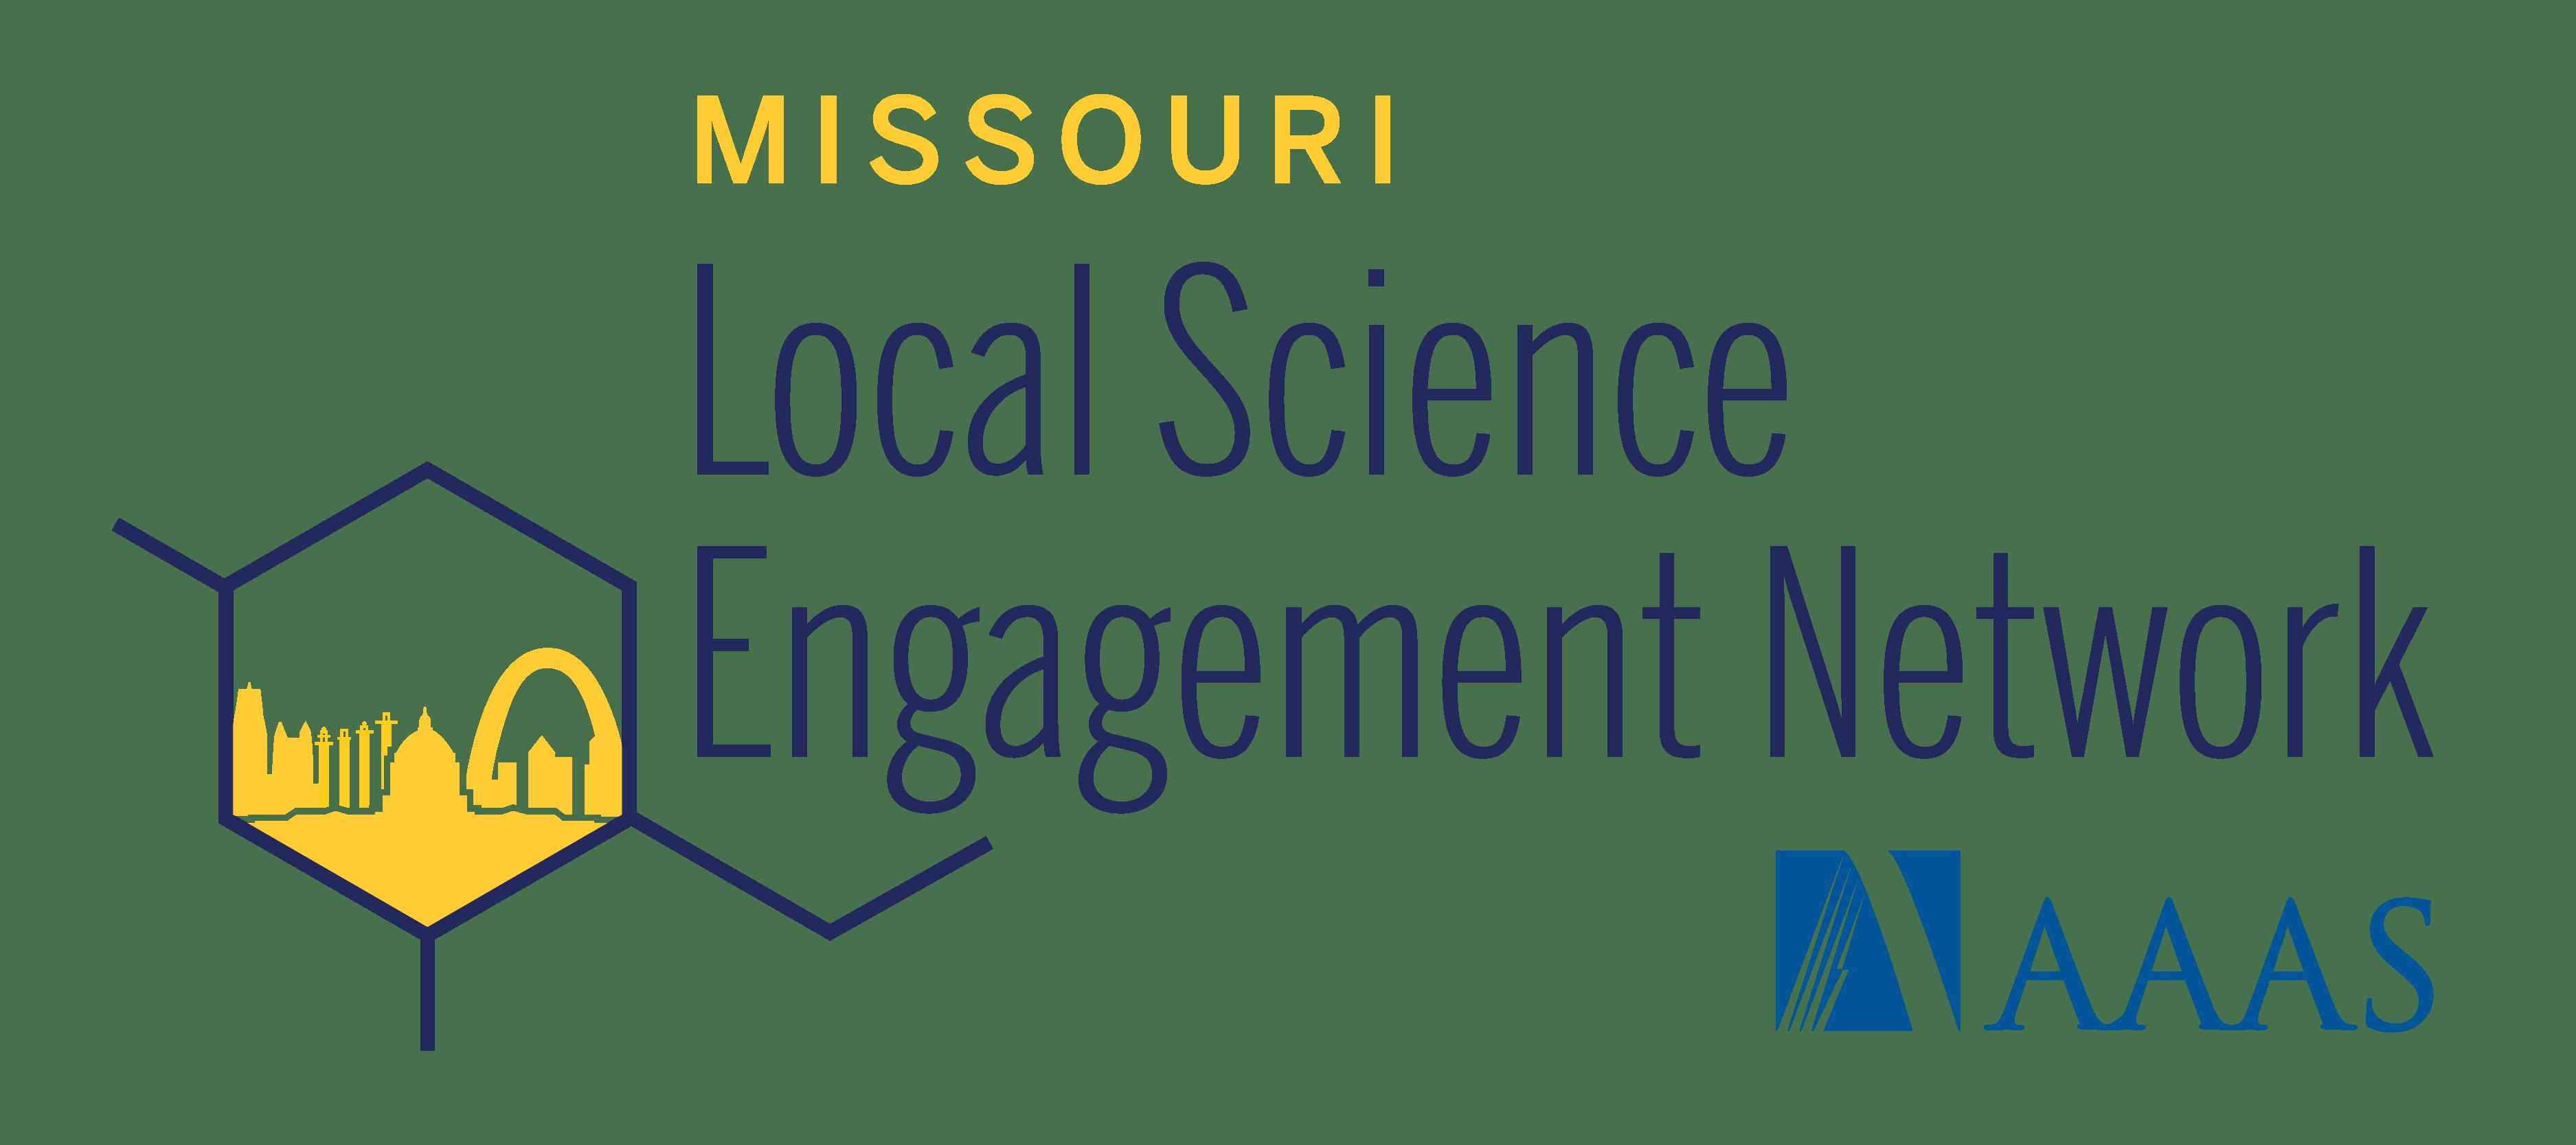 Missouri Local Science Engagement Network